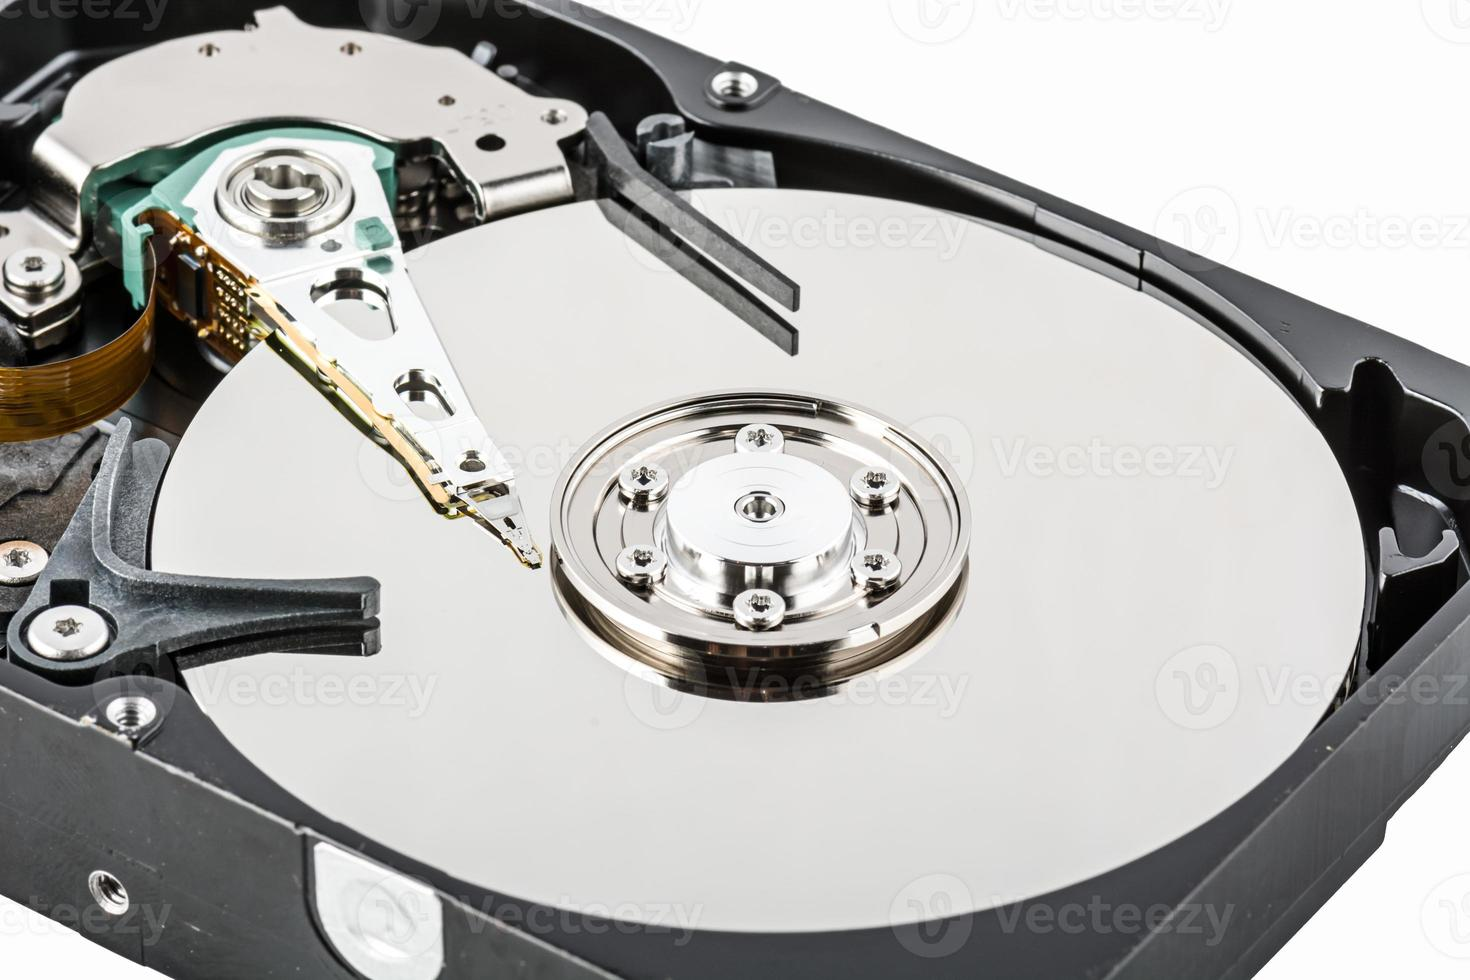 detalles de partes de un disco duro foto